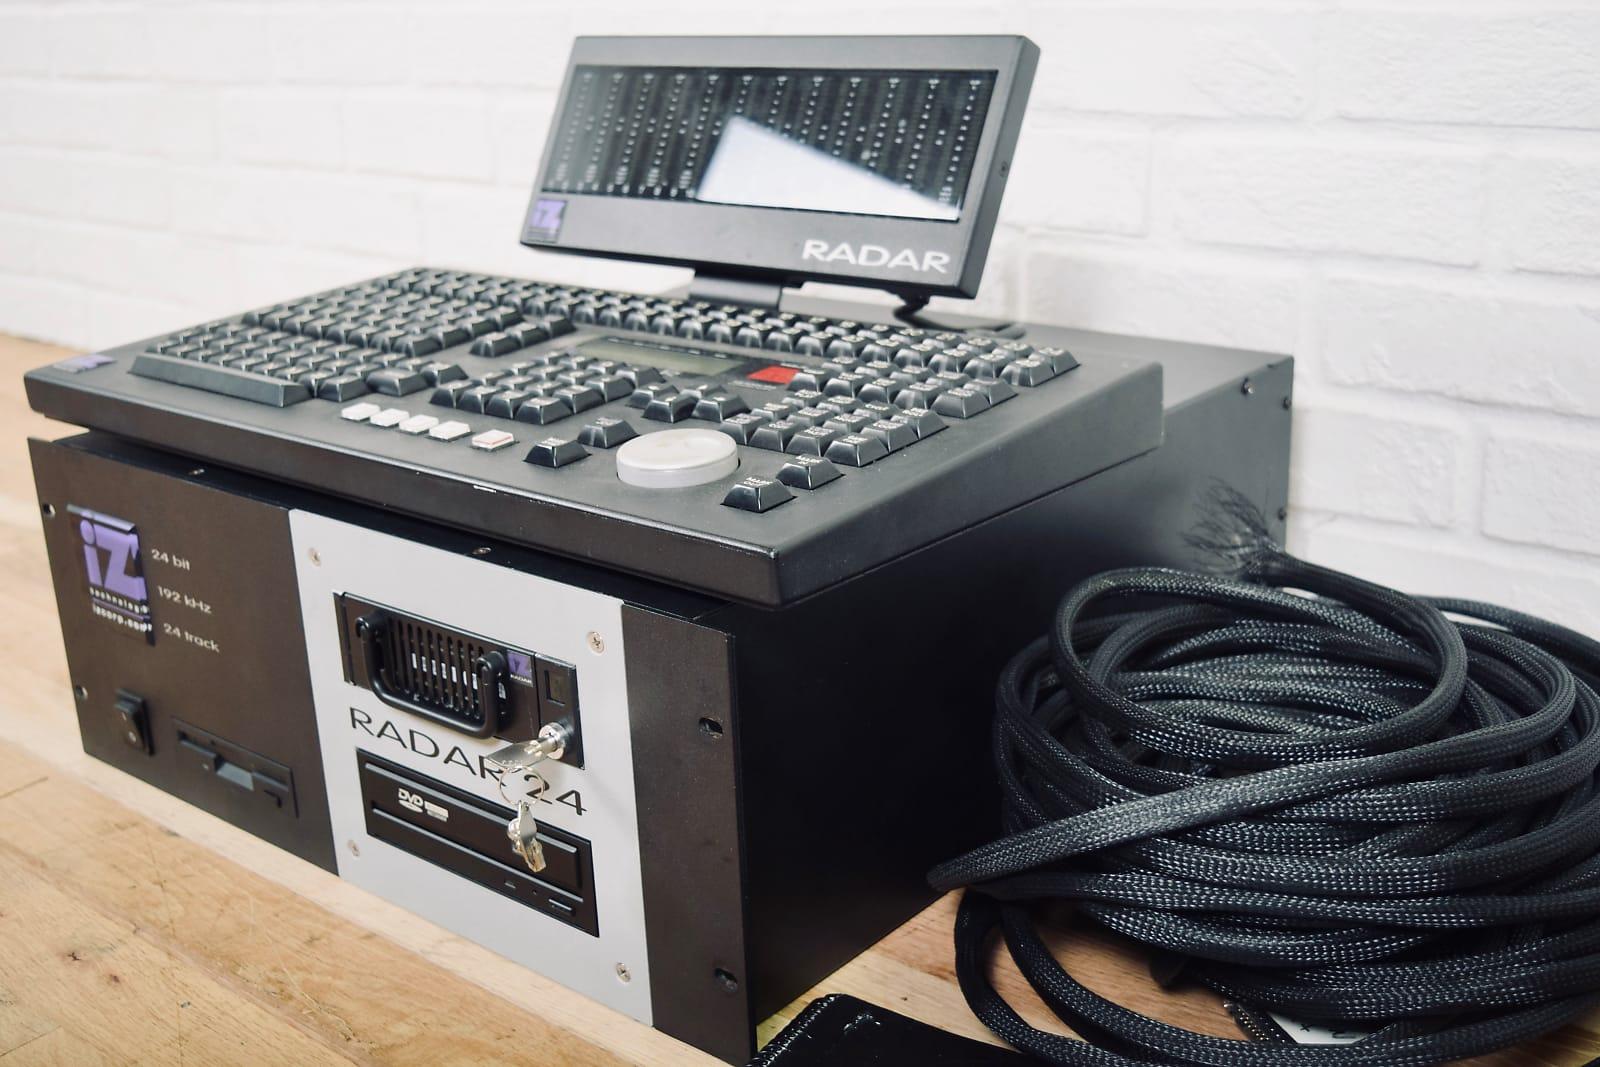 IZ Radar 24 track 192 khz digital recorder with controller, meter bridge  Analog